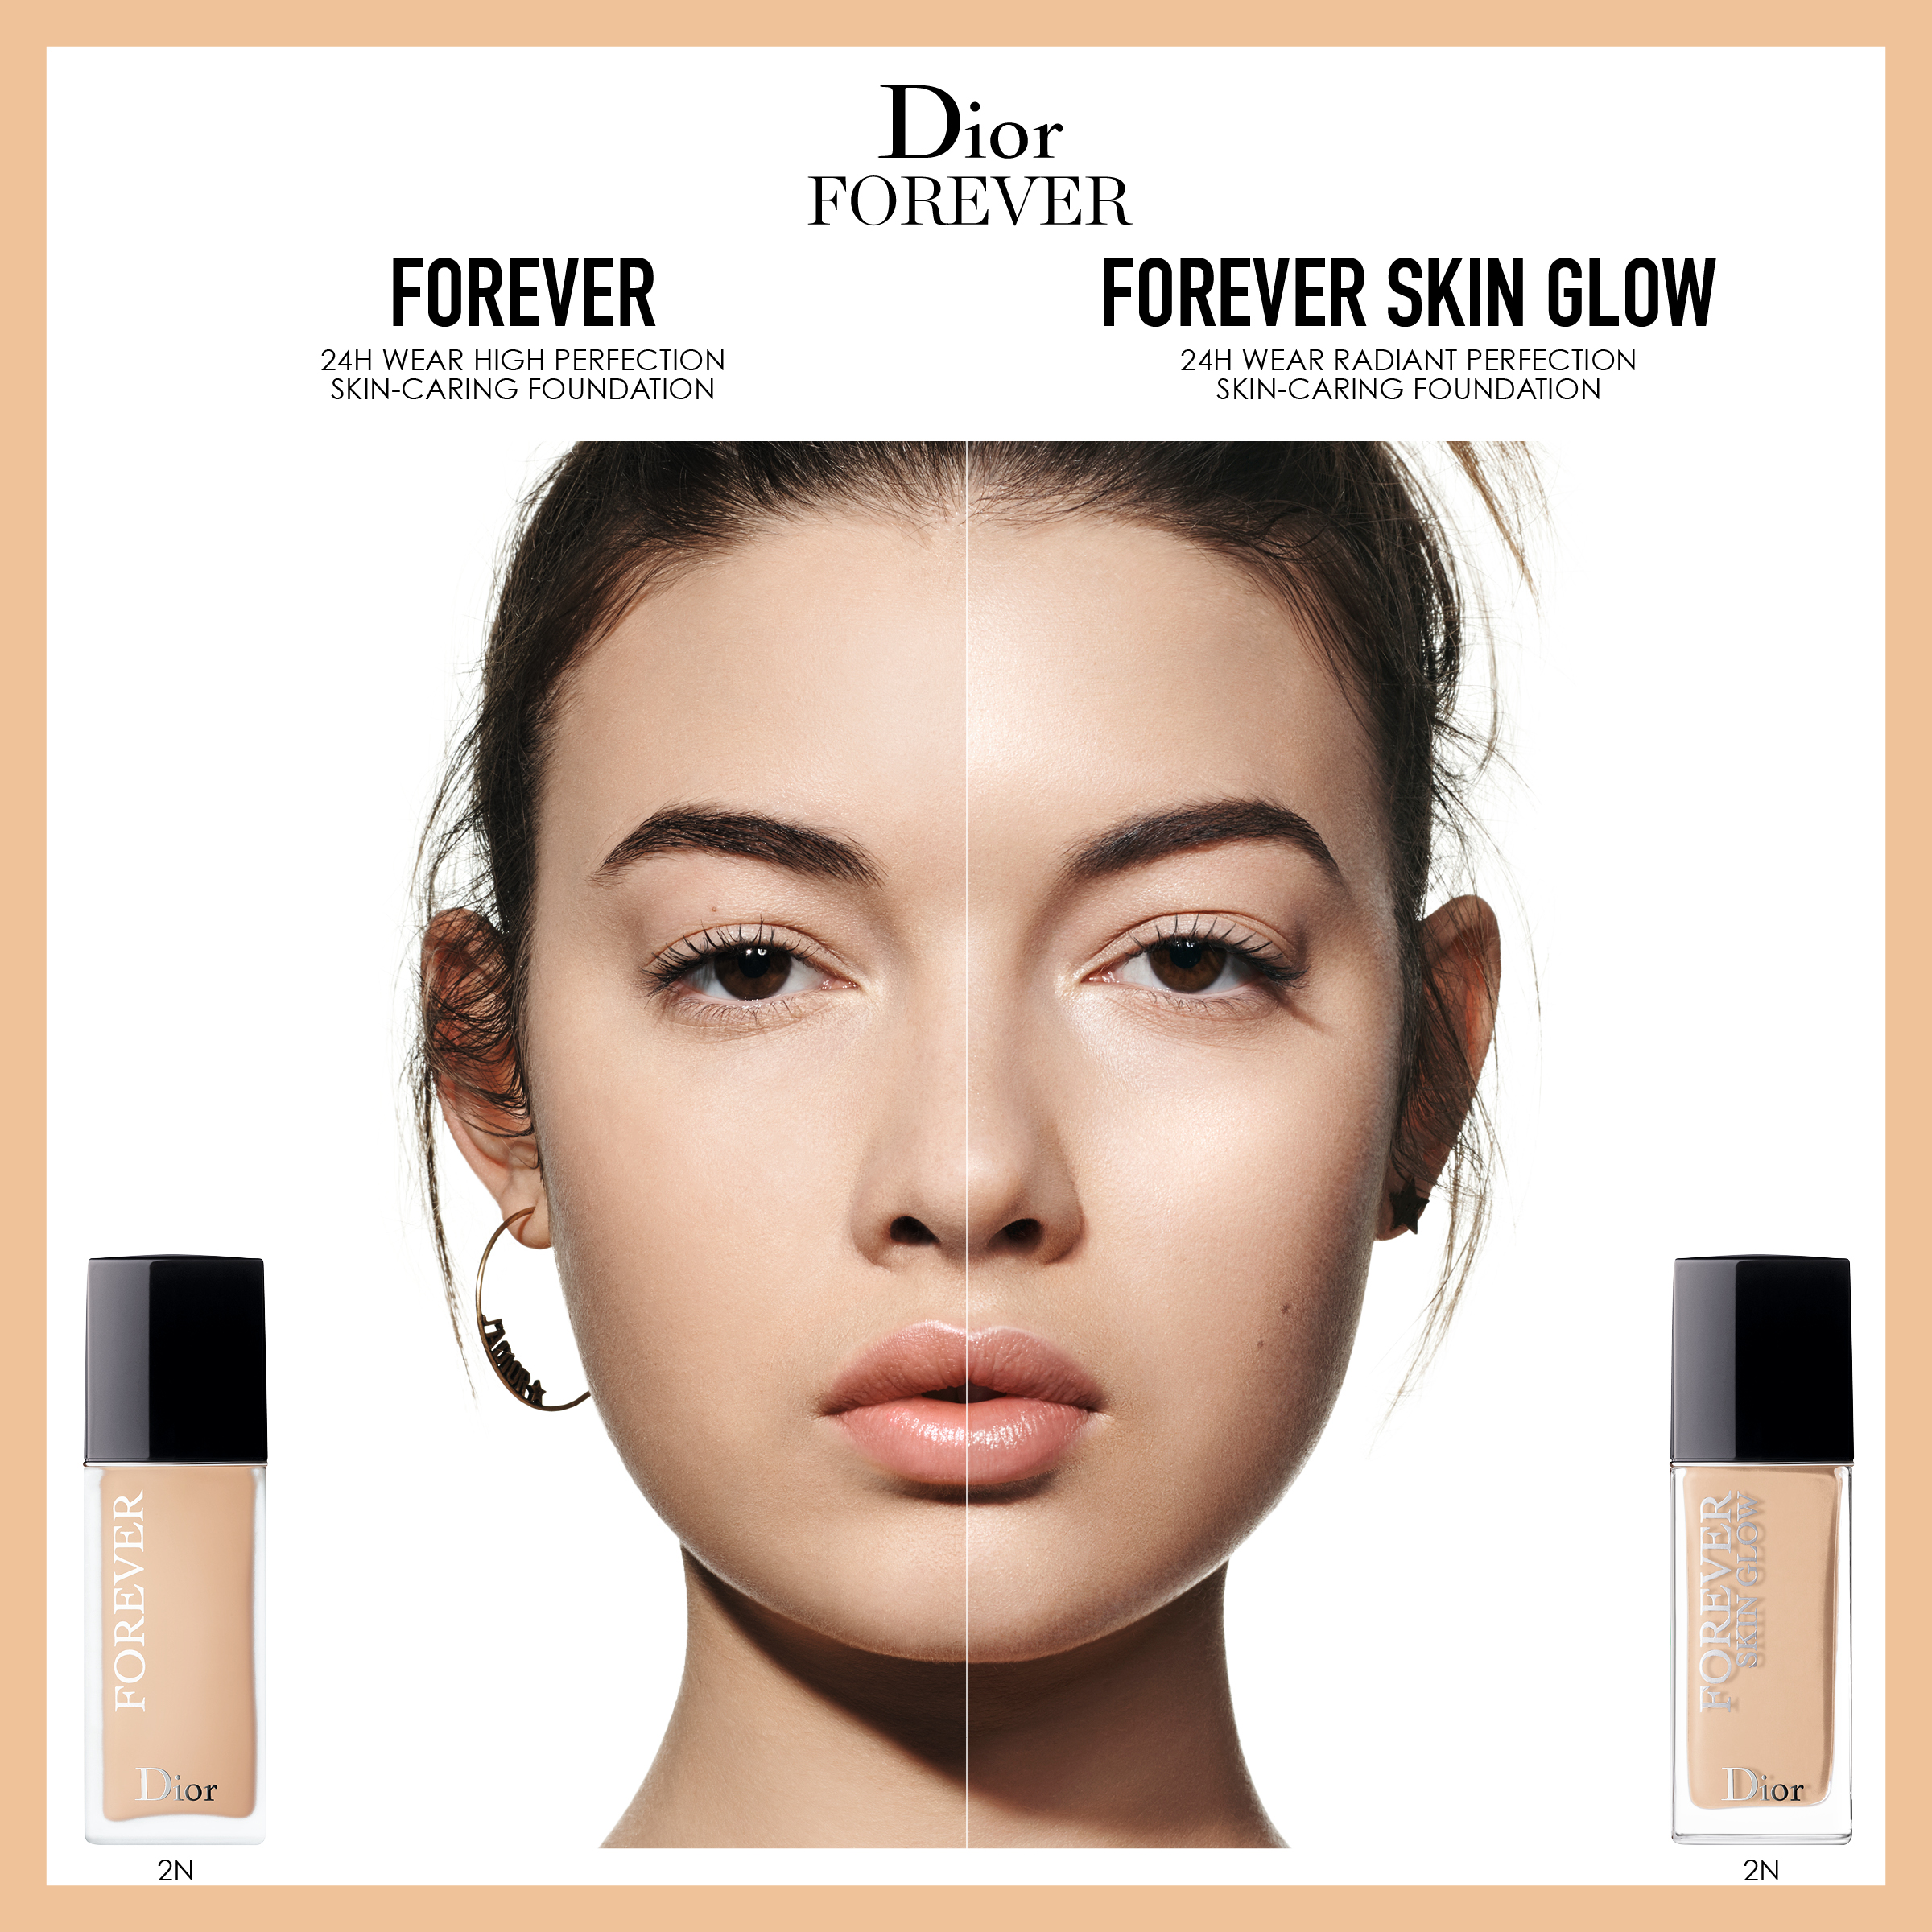 DIOR Forever Skin Glow Foundation, 2.5 Neutral